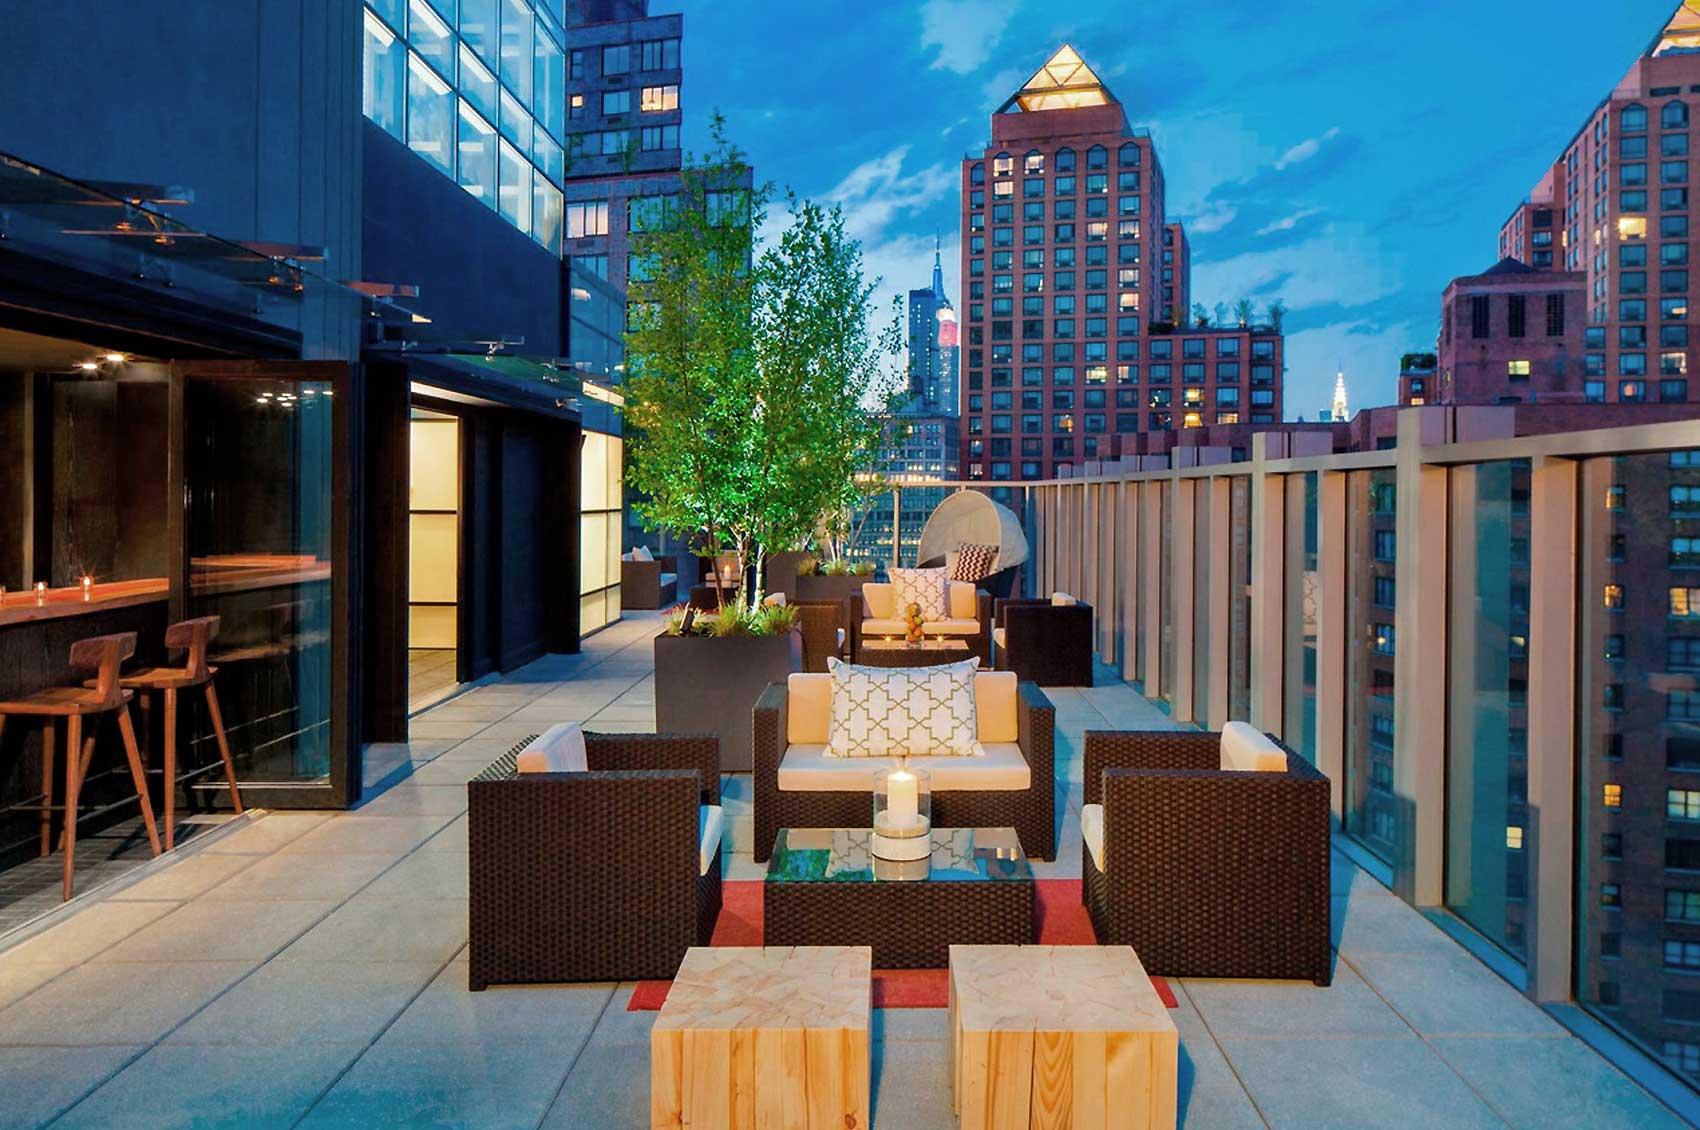 Hyatt union square new york fodor 39 s 100 hotel awards 2013 - Hoteles de lujo granada ...